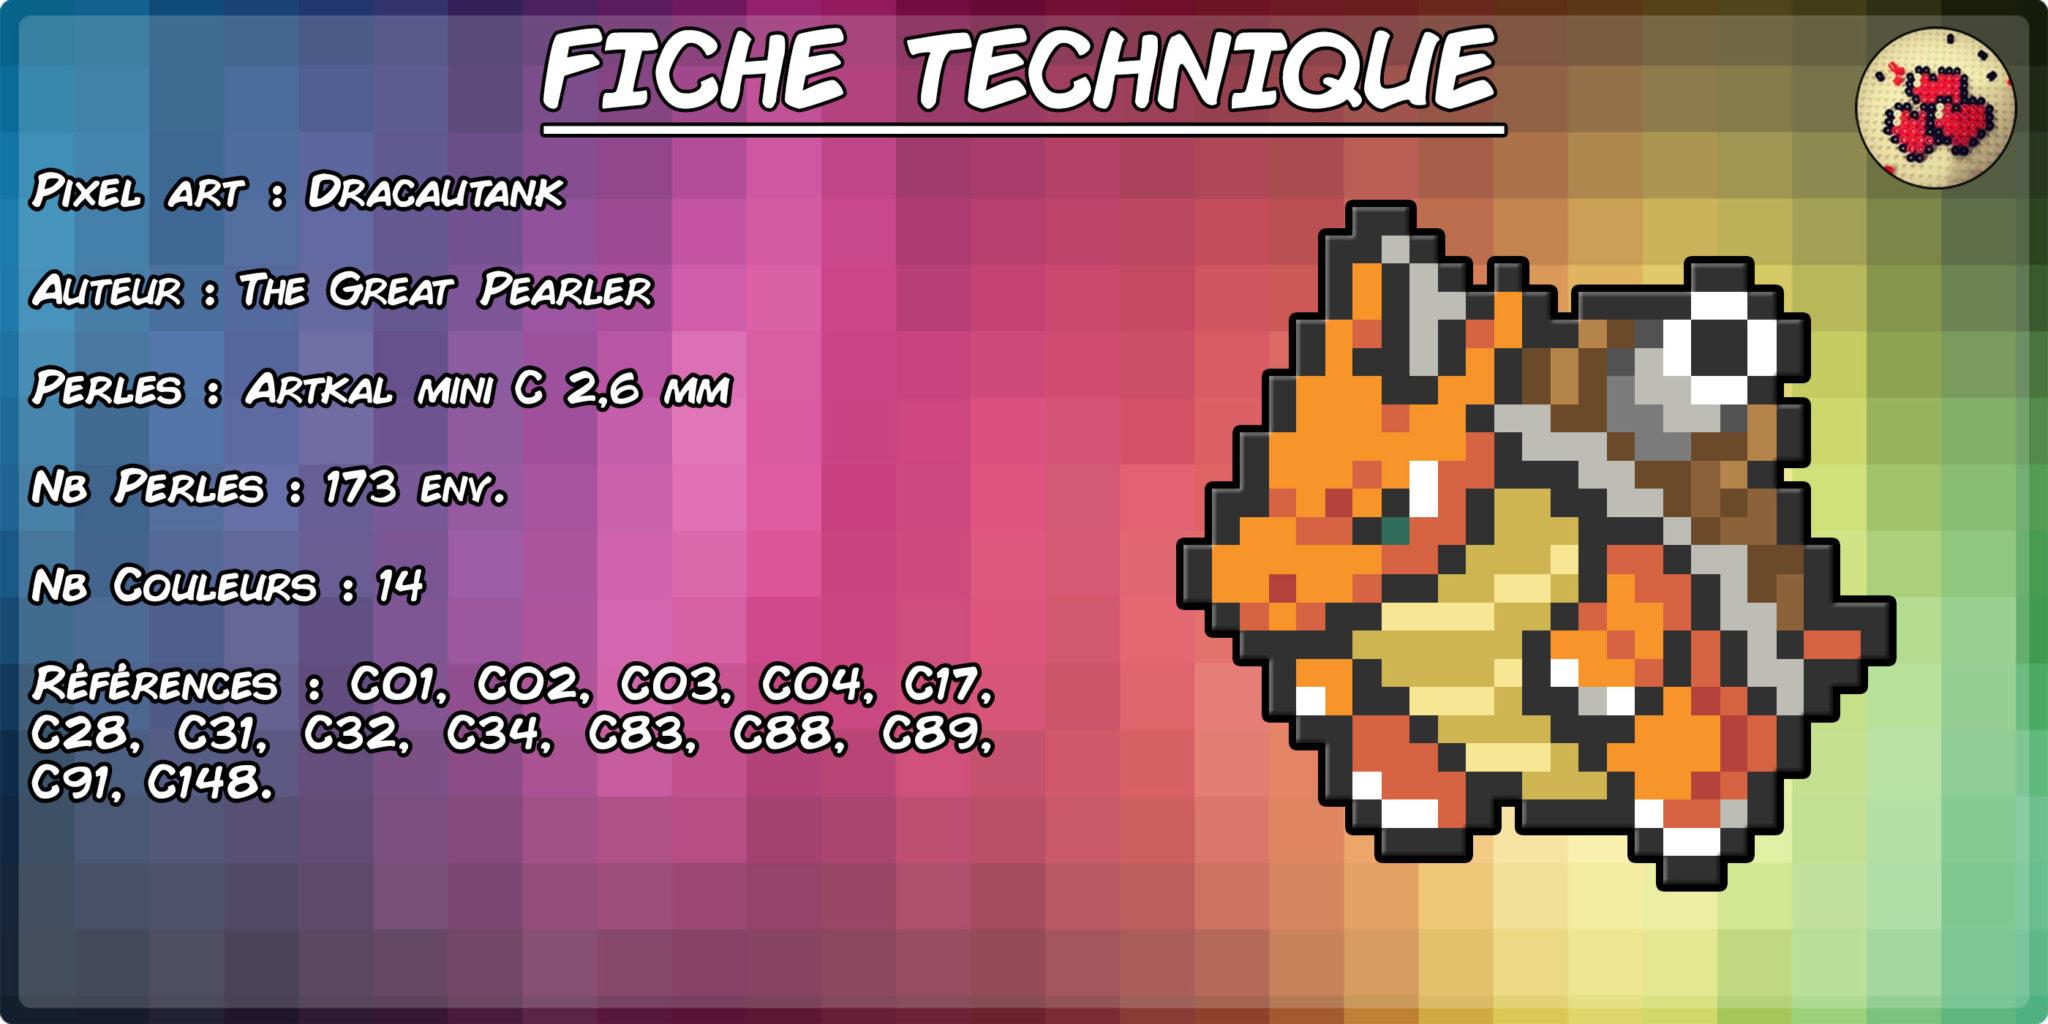 fiche-dracotank-fusion-pokemon-pixel-card-pixelart-pixelcraft-pixelbeads-perlerbeads-perlerart-hama-hamabeads-hamasprites-artkal-artkalbeads-fusebeads-retro-gaming-sprite-design-tutoriel